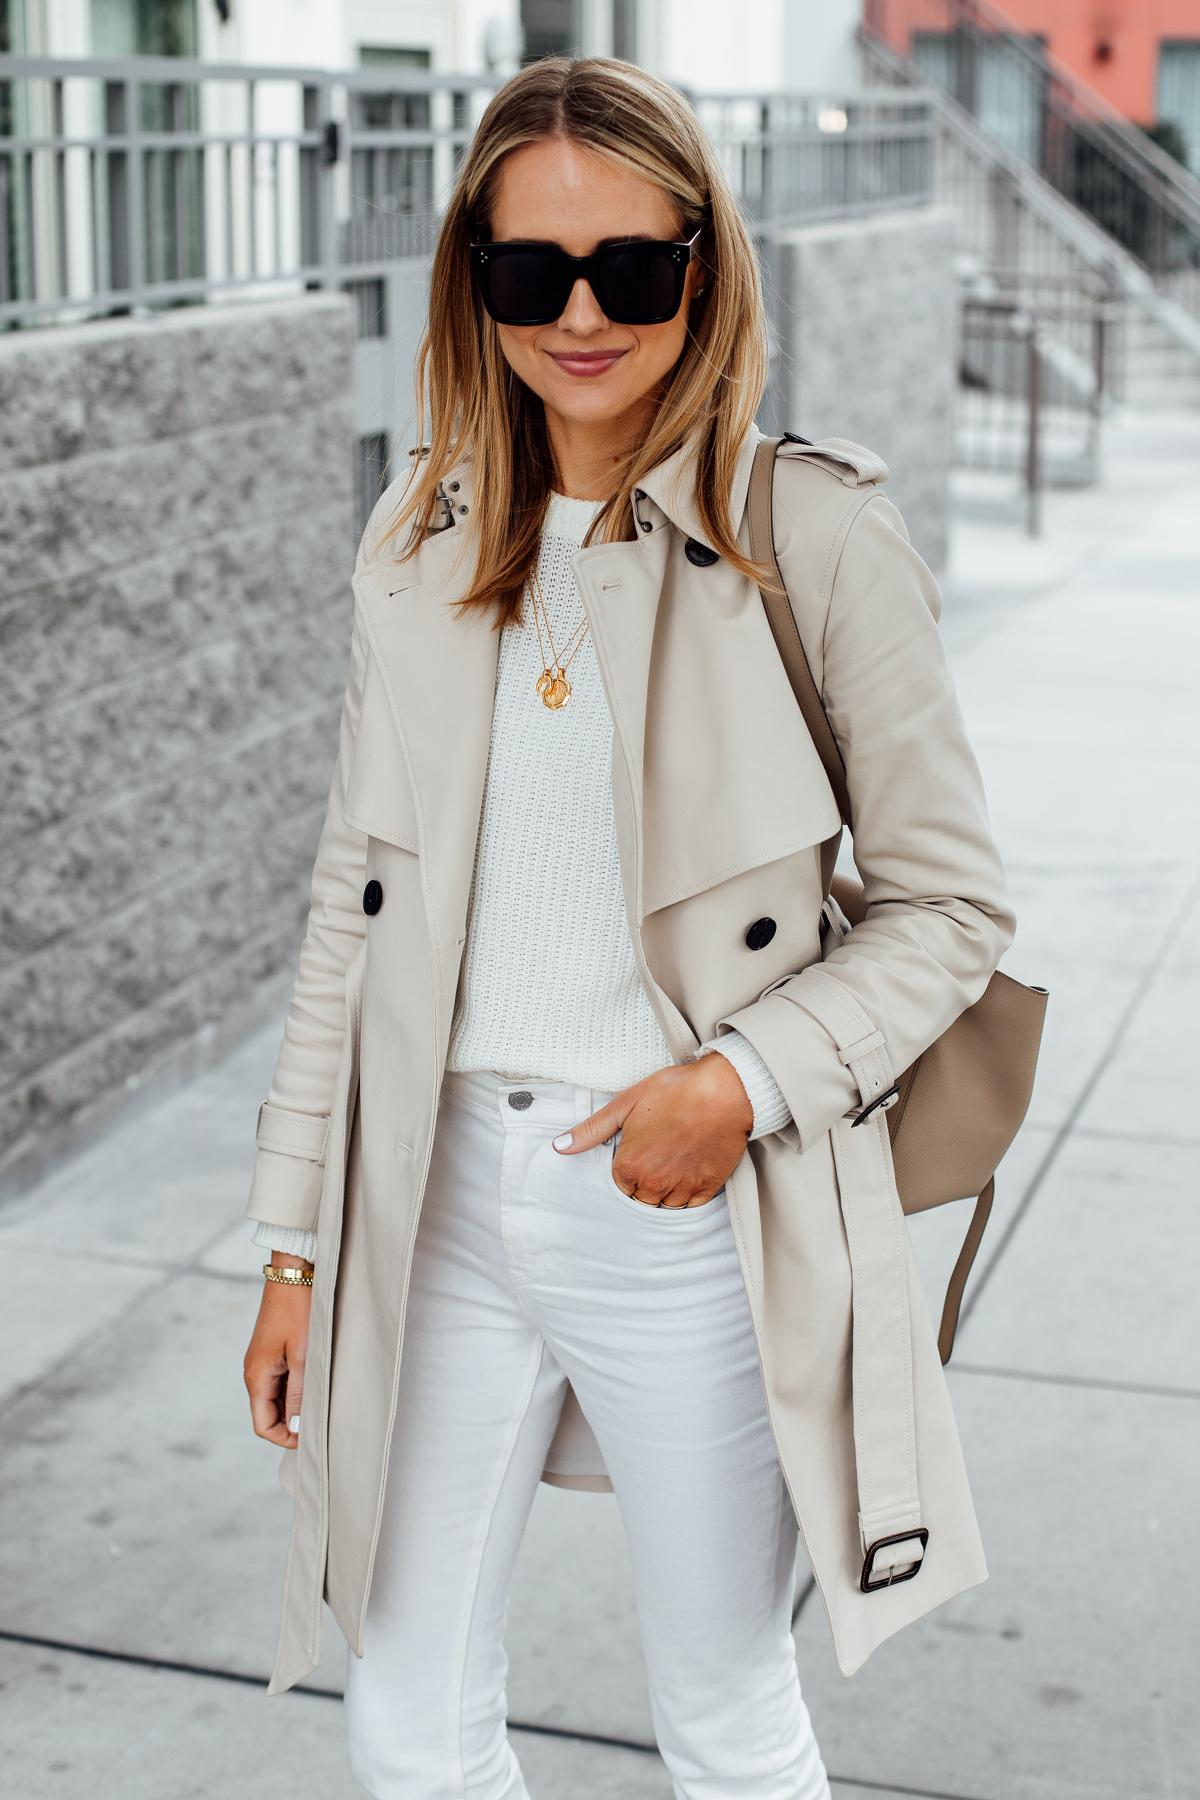 Blonde Woman Wearing Club Monaco Trench Coat White Sweater White Jeans Celine Mini Belt Bag Fashion Jackson San Diego Fashion Blogger Street Style